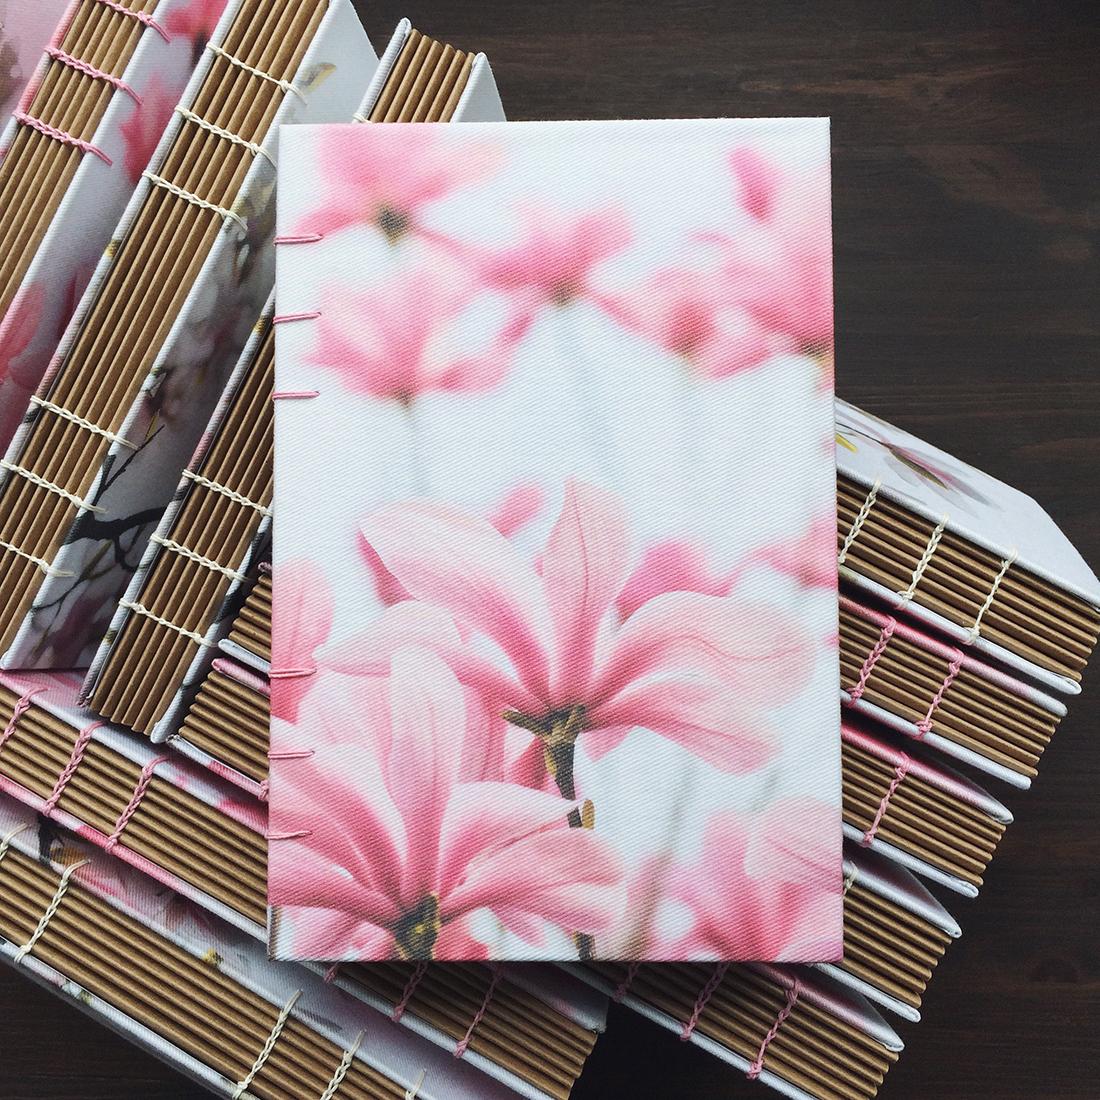 karolina-koziel-photography-products-journals.jpg